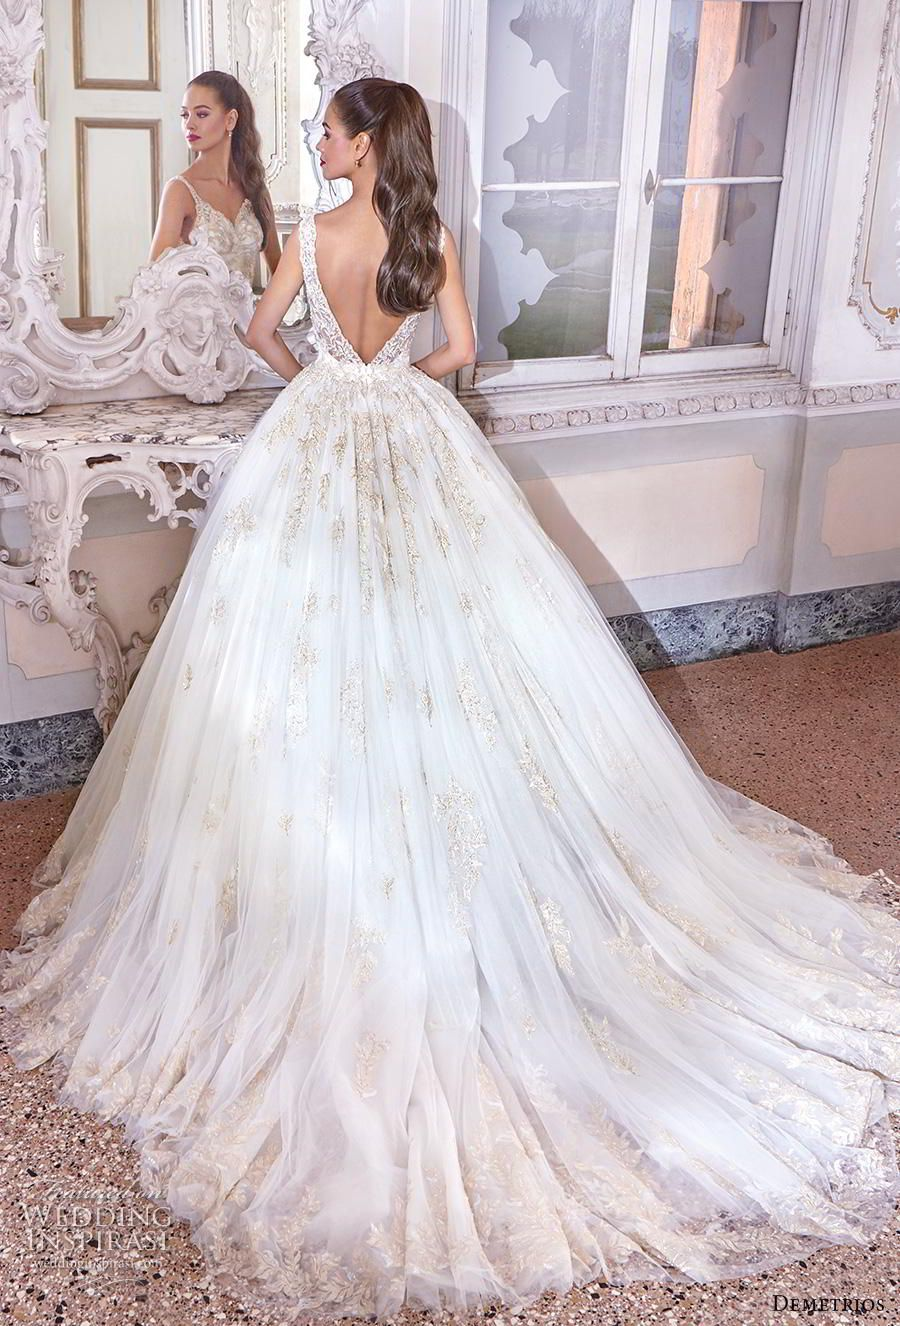 a9bc6a2c242 demetrios 2019 bridal sleeveless deep v neck heavily embellished bodice  glitzy glamorous princess ball gown a line wedding dress backless v back  chapel ...